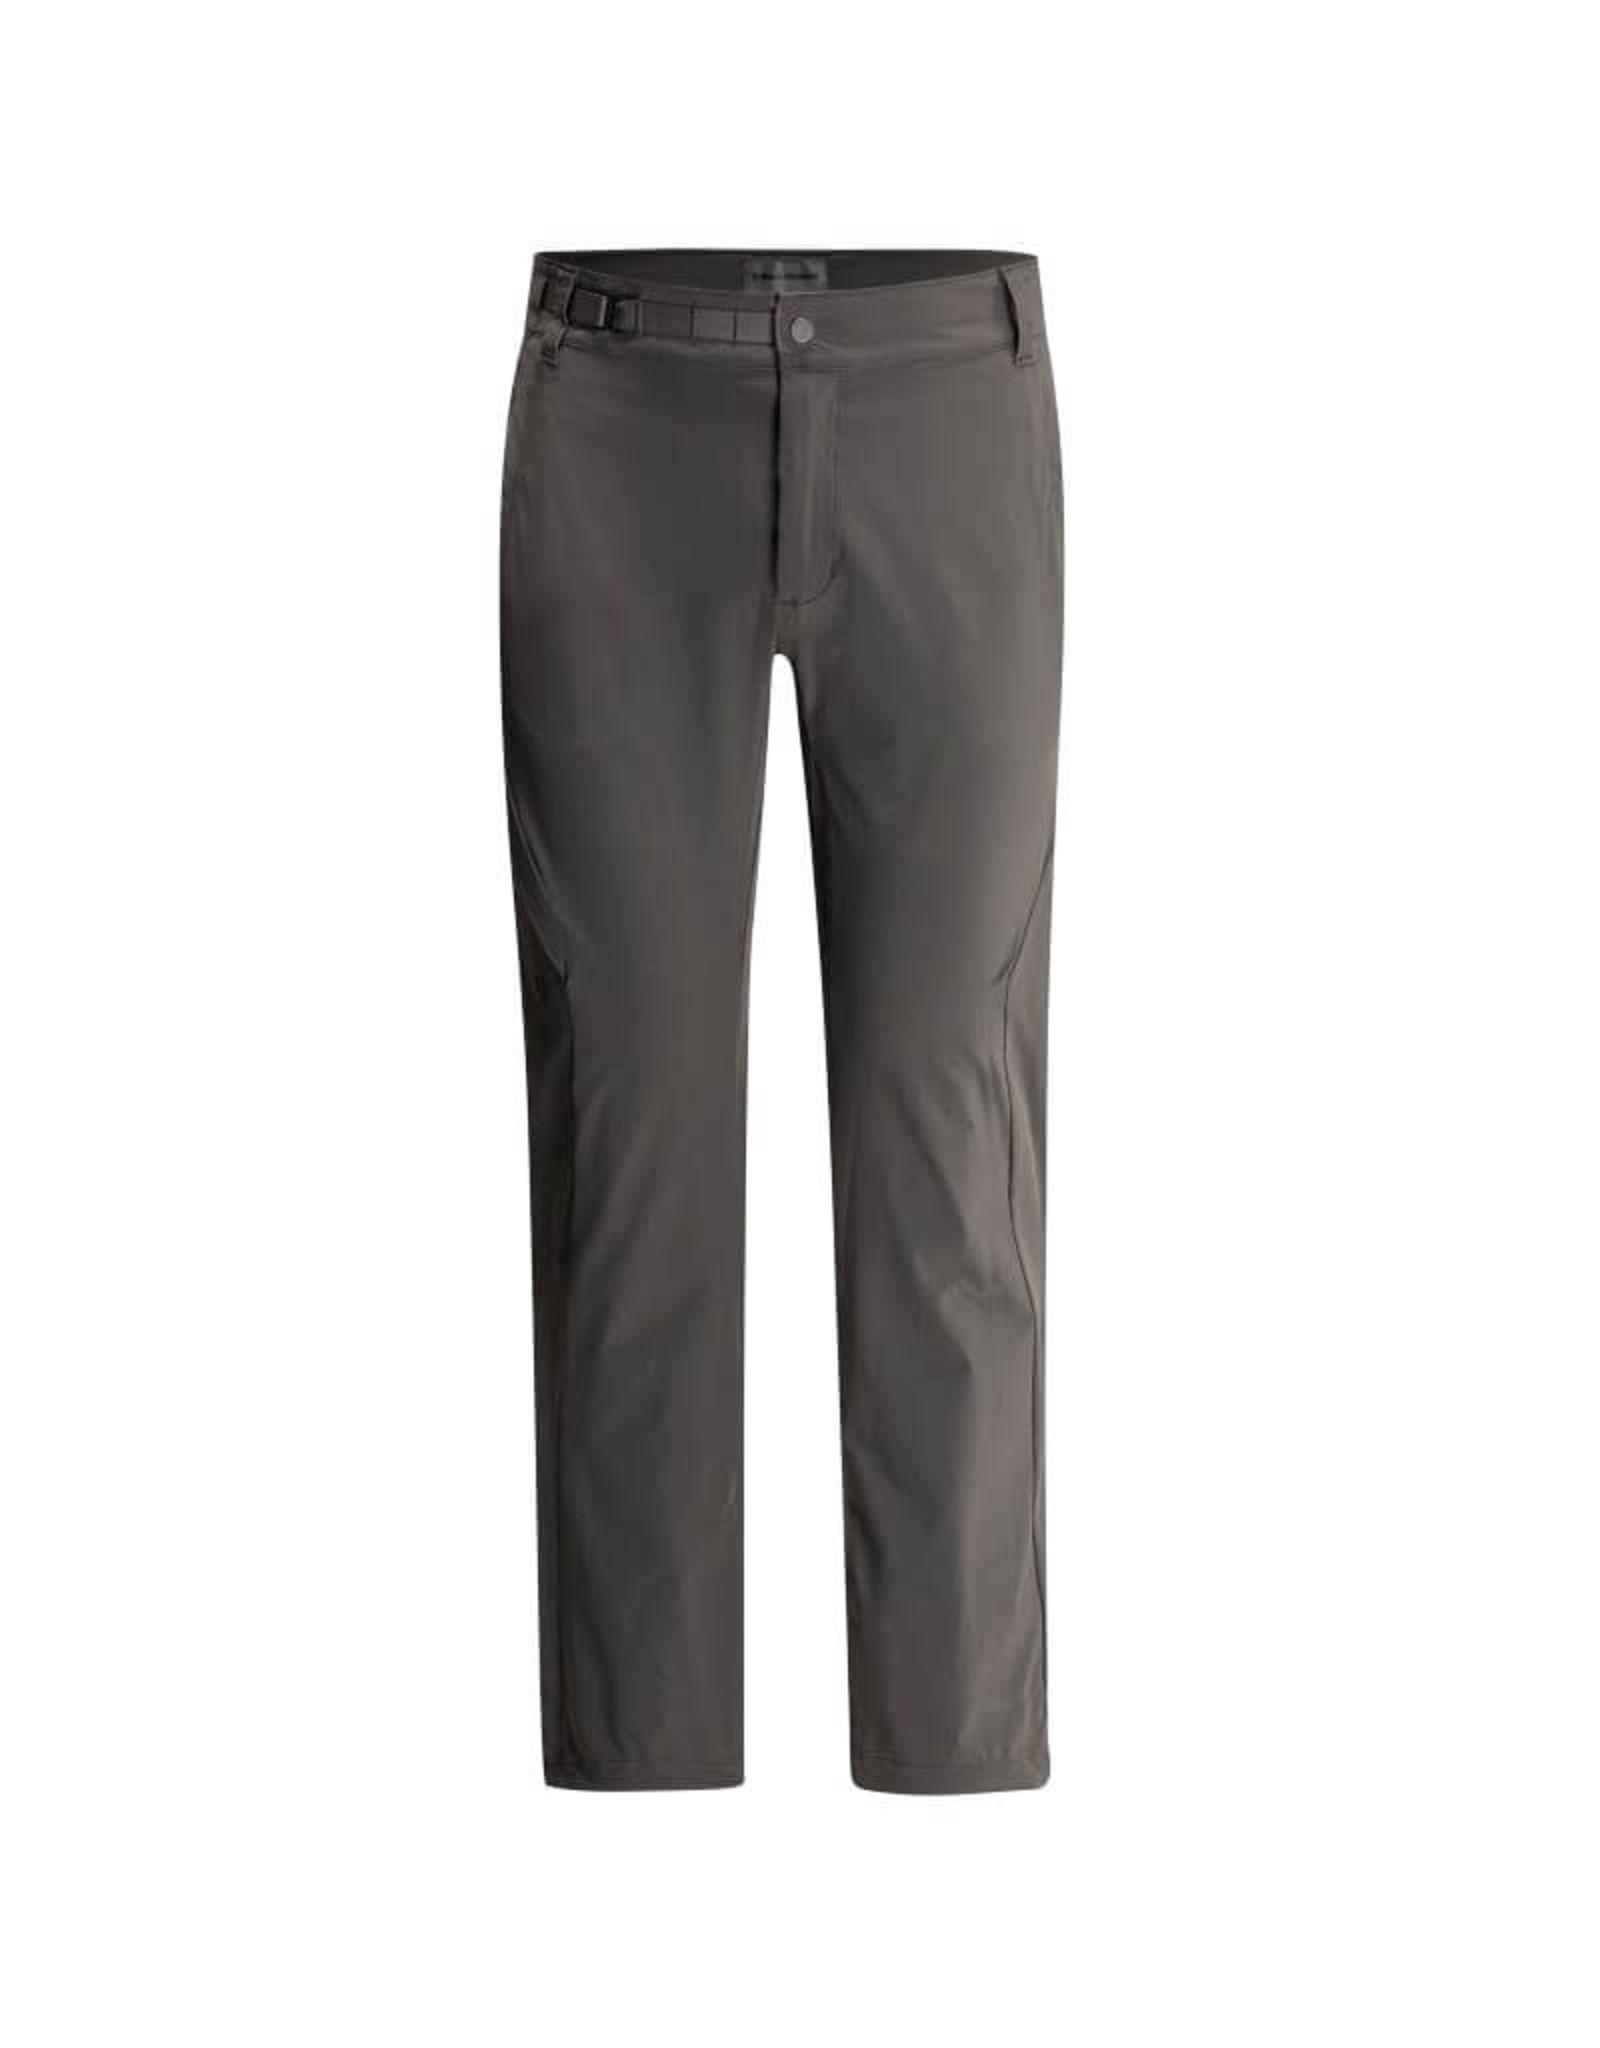 Black Diamond Black Diamond Alpine Light Pants - Men